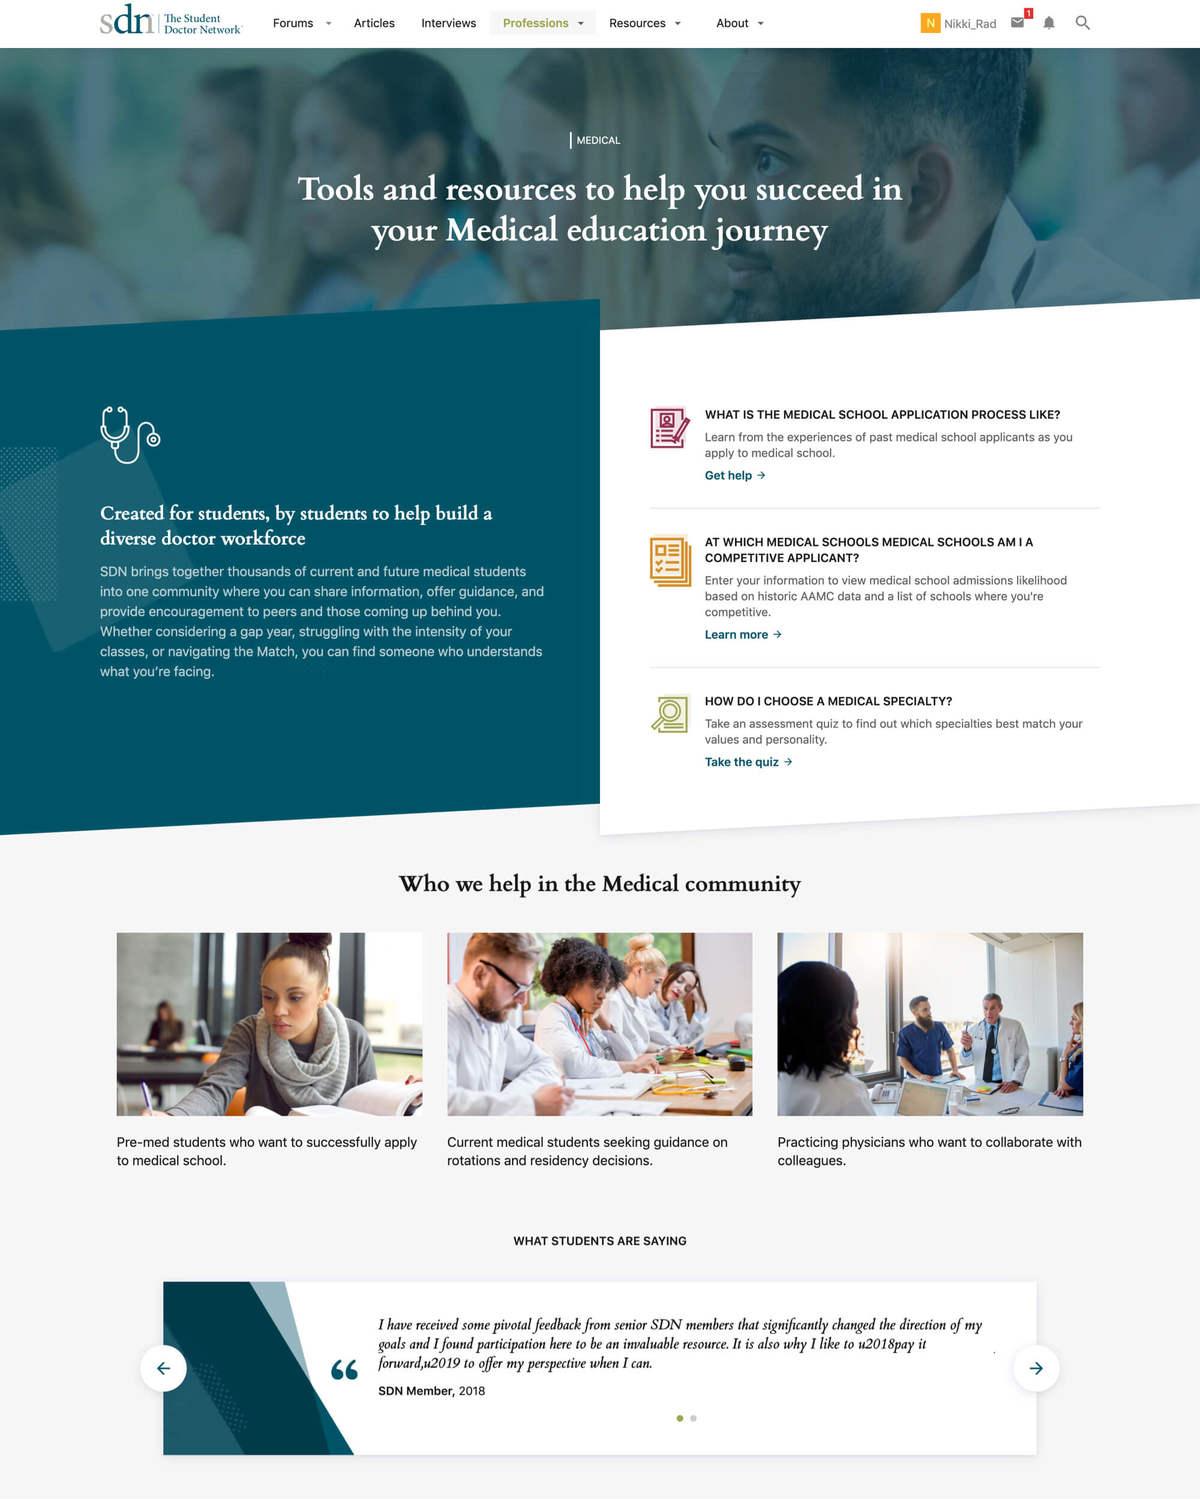 Student Doctor Network Website and Community | Portfolio